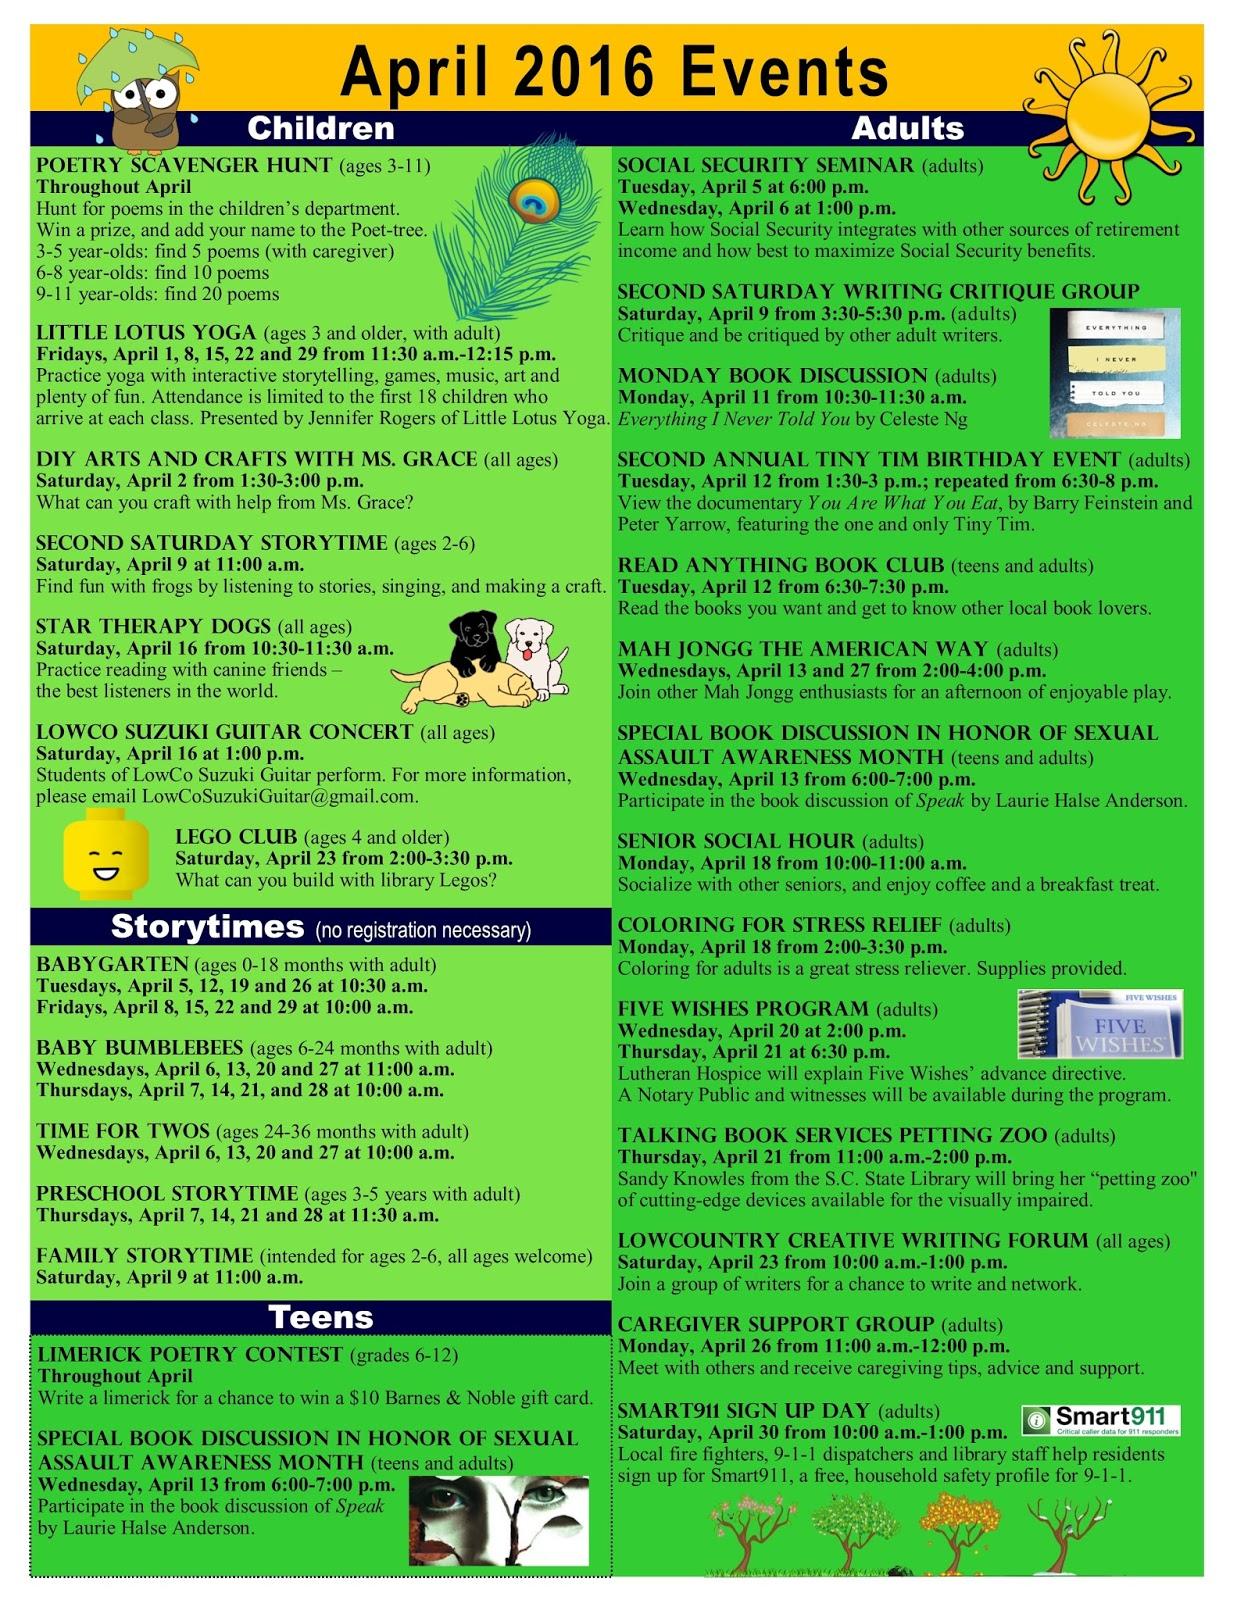 medium resolution of aramco operational calendar 2014 auto electrical wiring diagram rh wiring diagram edu fr keldean co uk